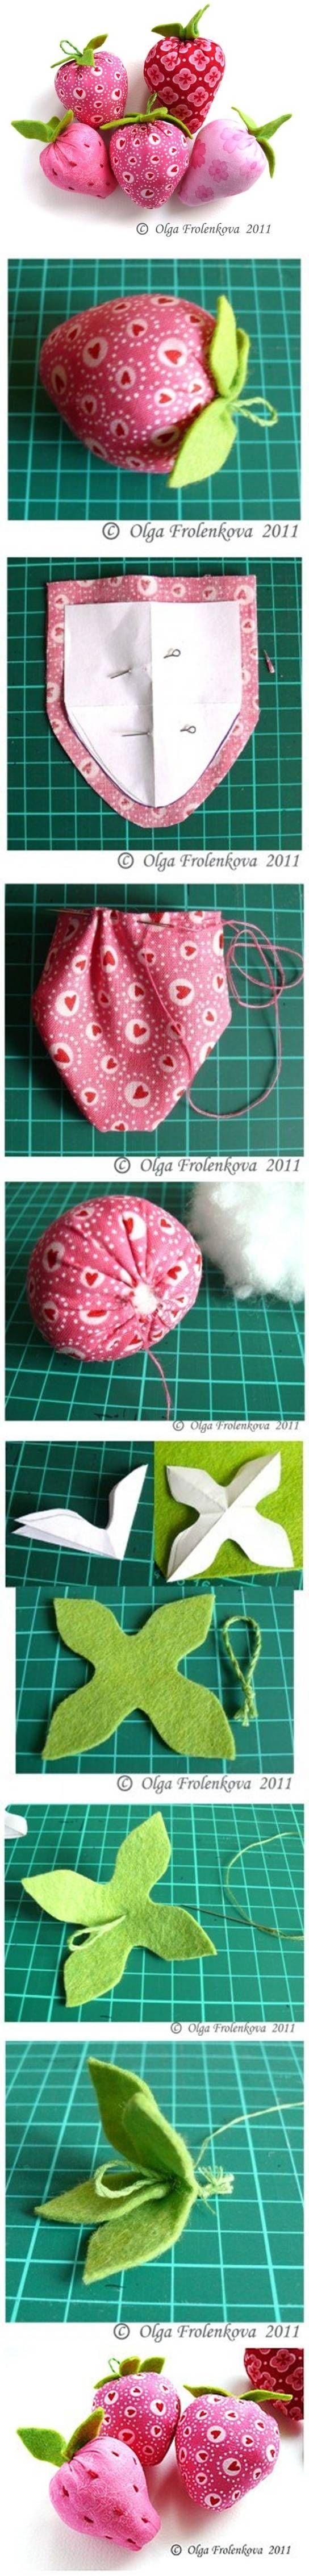 DIY Sew Fabric Strawberry via usefuldiy.com